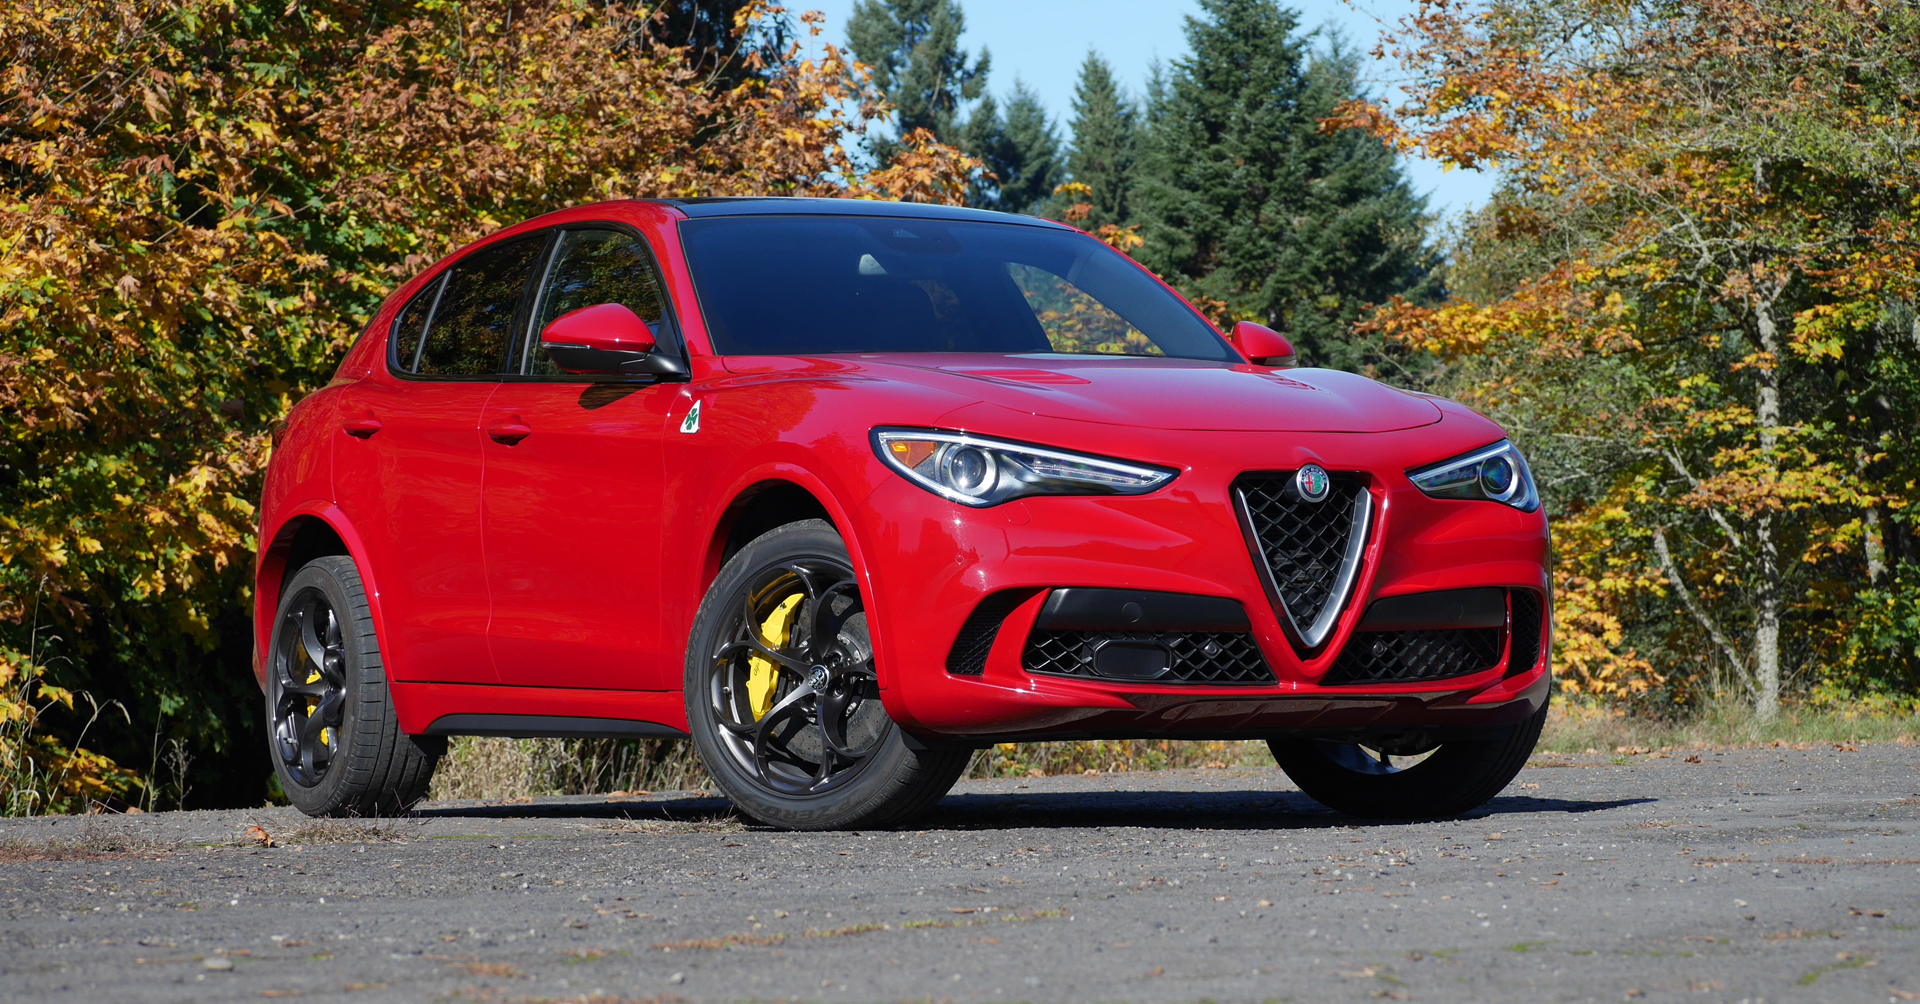 Adding to the Lineup of the Alfa Romeo Stelvio